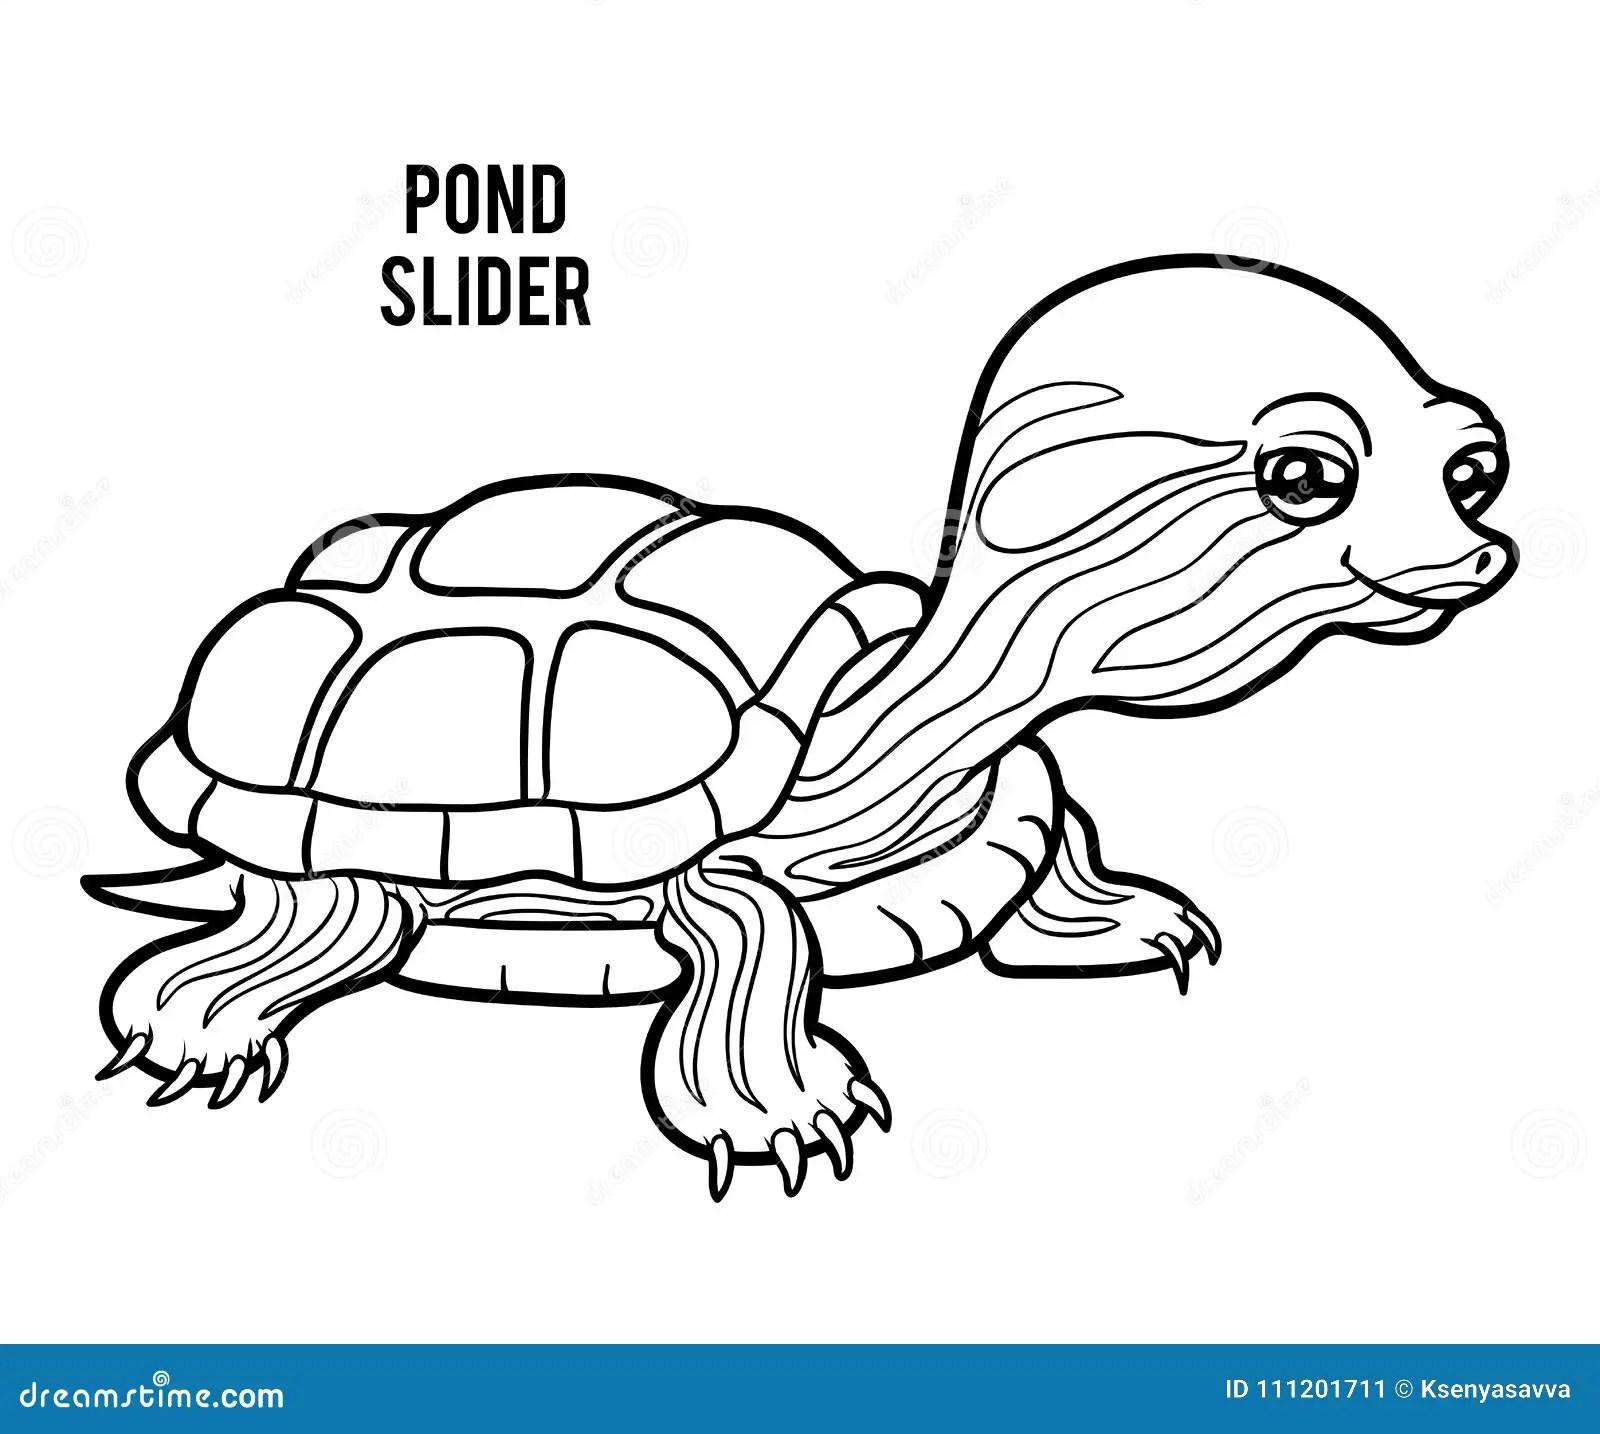 Coloring Book Pond Slider Stock Vector Illustration Of